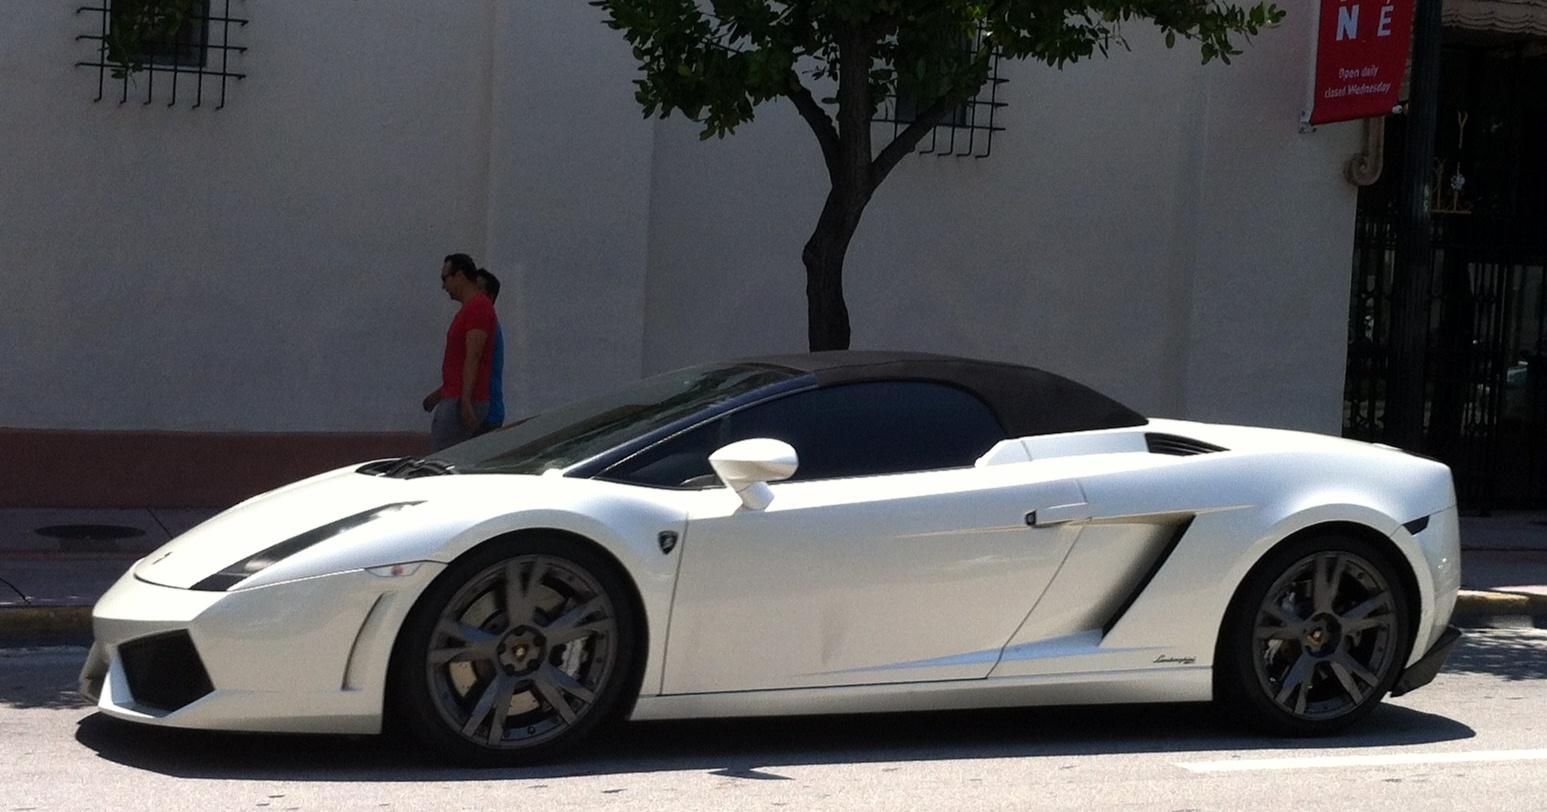 Pearl White Lamborghini Gallardo Spyder Exotic Cars On The